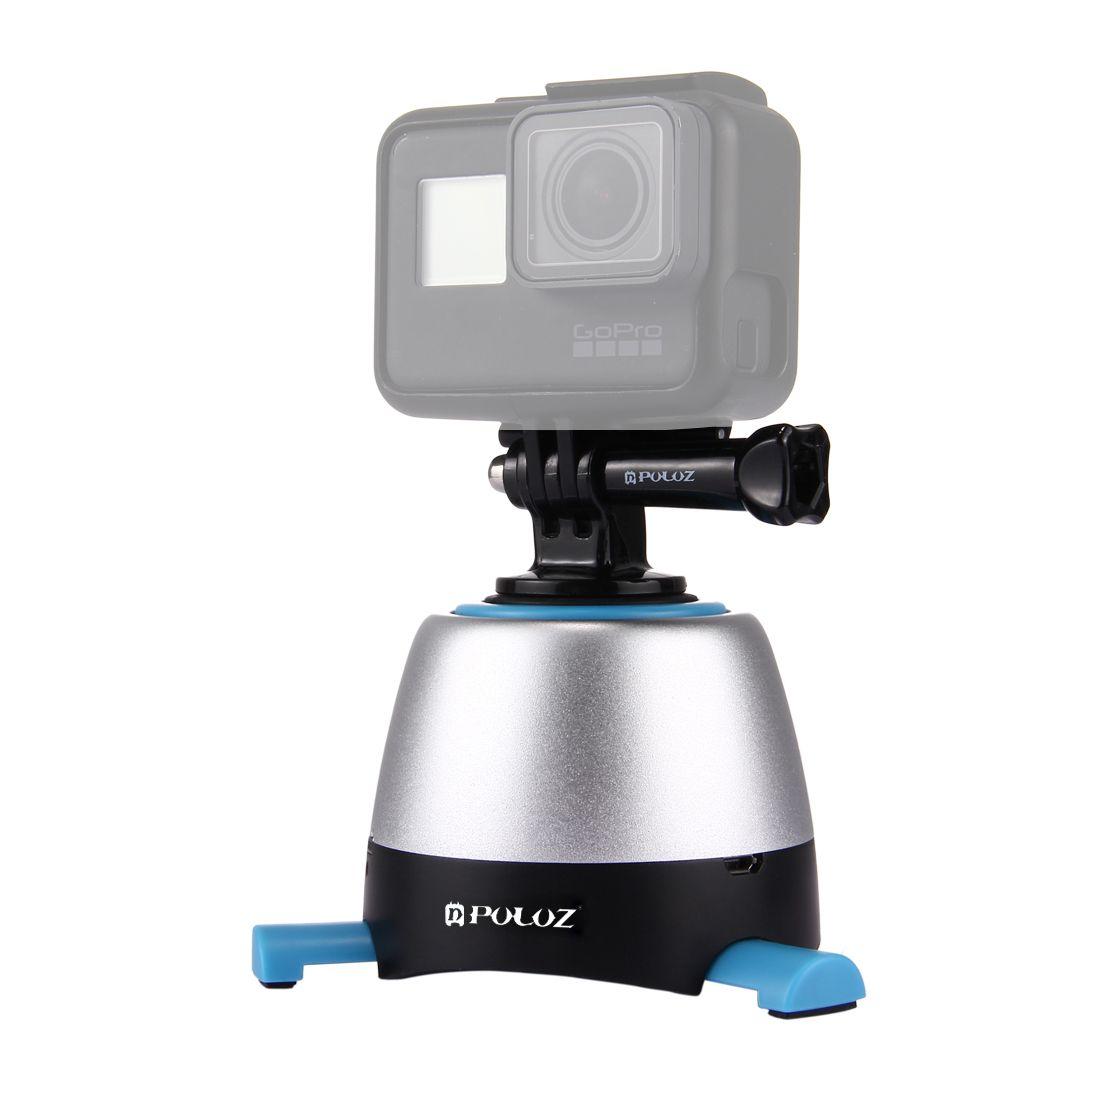 Harga Monopod Weifeng Wt 1003 Update 2018 Lem Pulut Lemjebak Burung Puluz Pu360 360 Degree Bluetooth Remote Control Panoramic Multi Function Smartphone Gopro